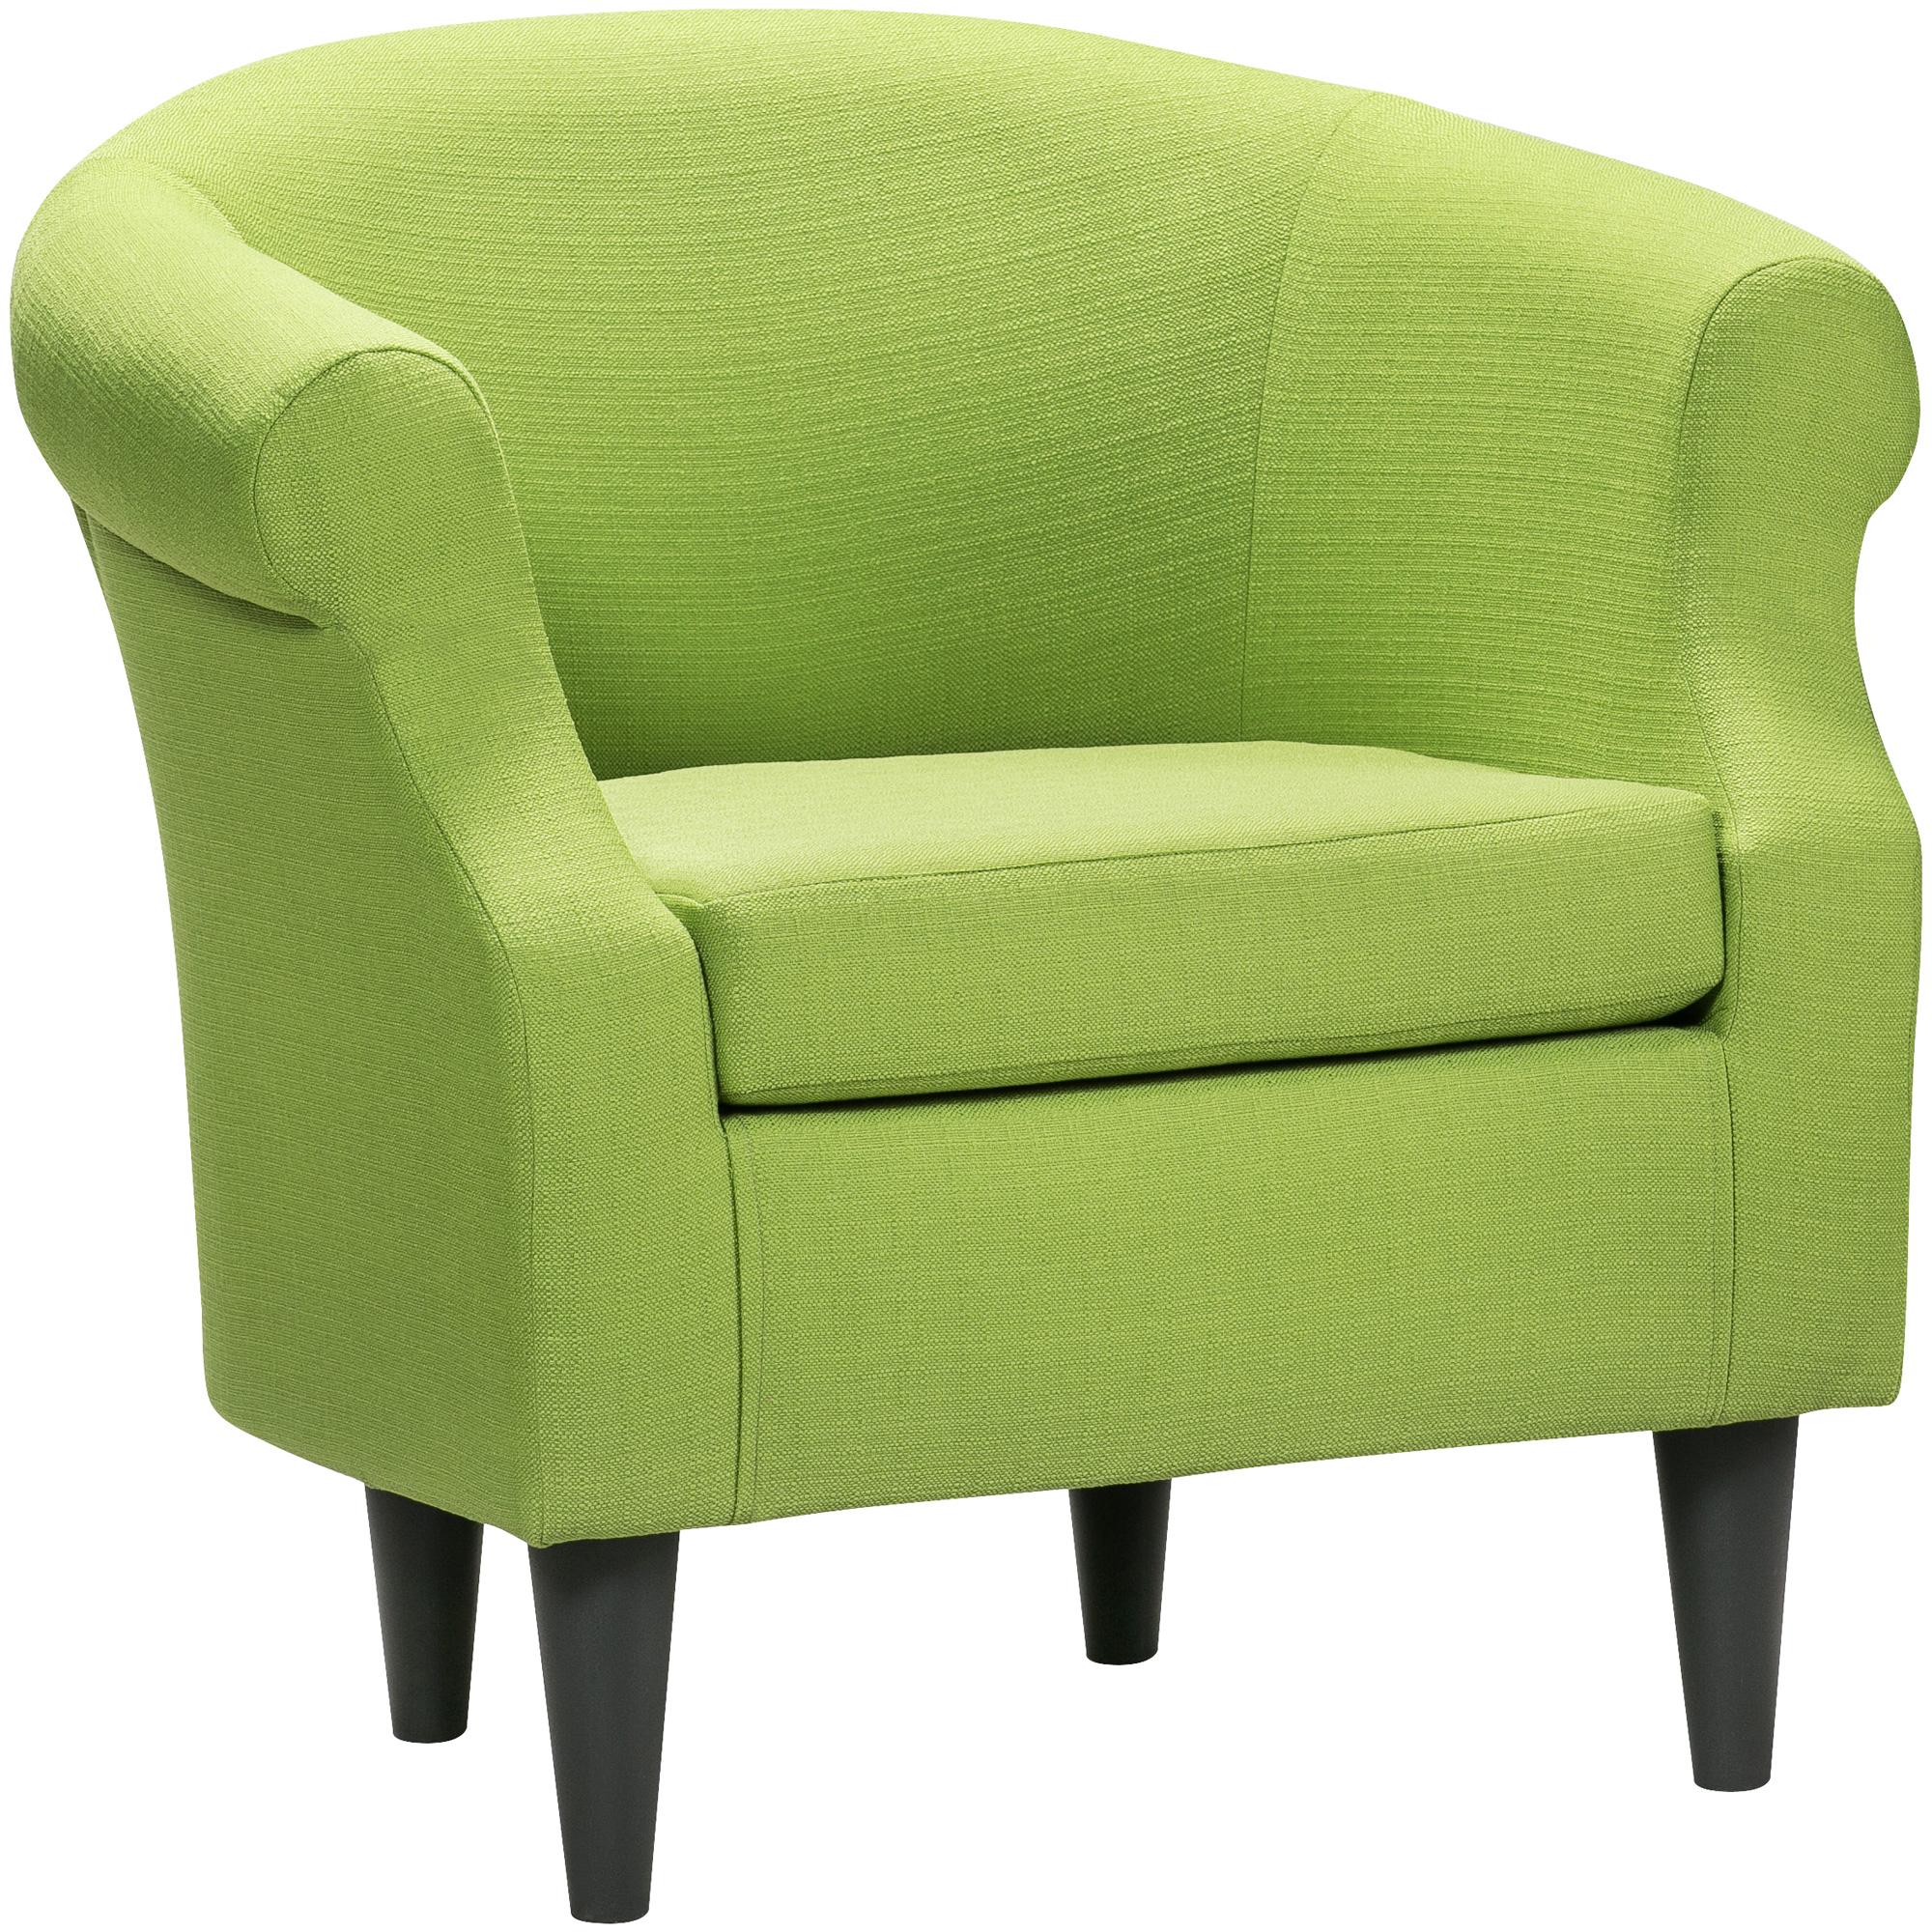 Overman | Nikole Grass Accent Chair